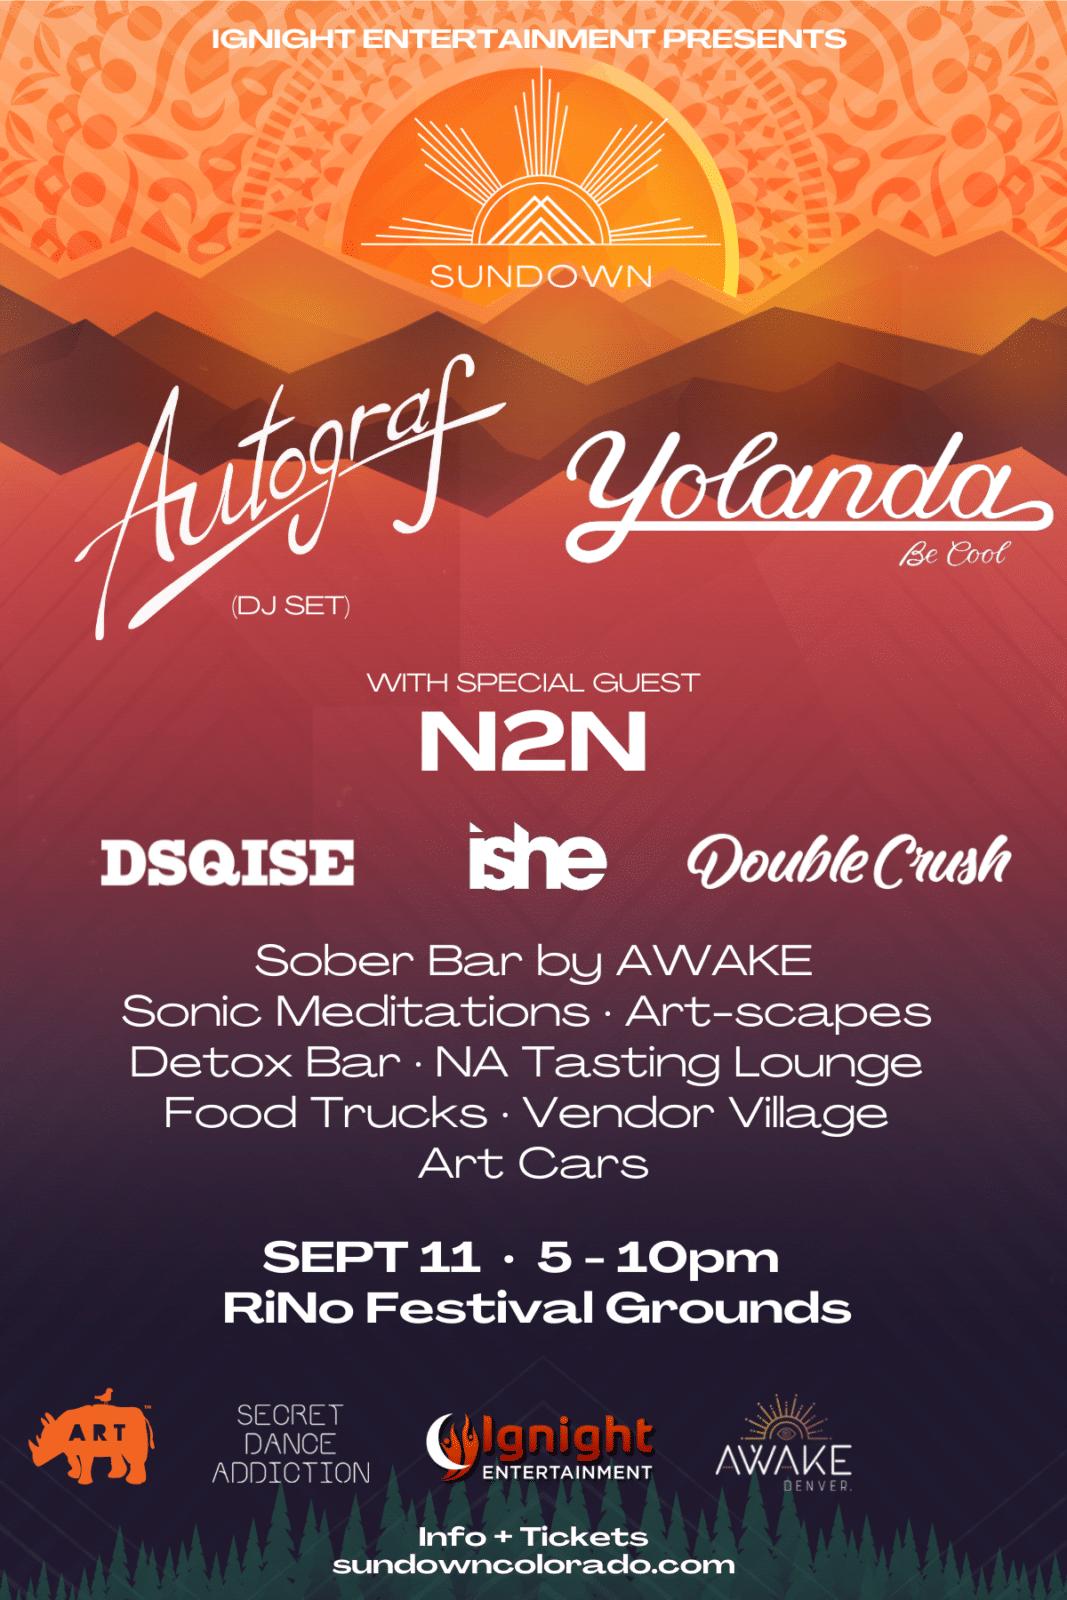 Image of the Sundown Colorado music event poster